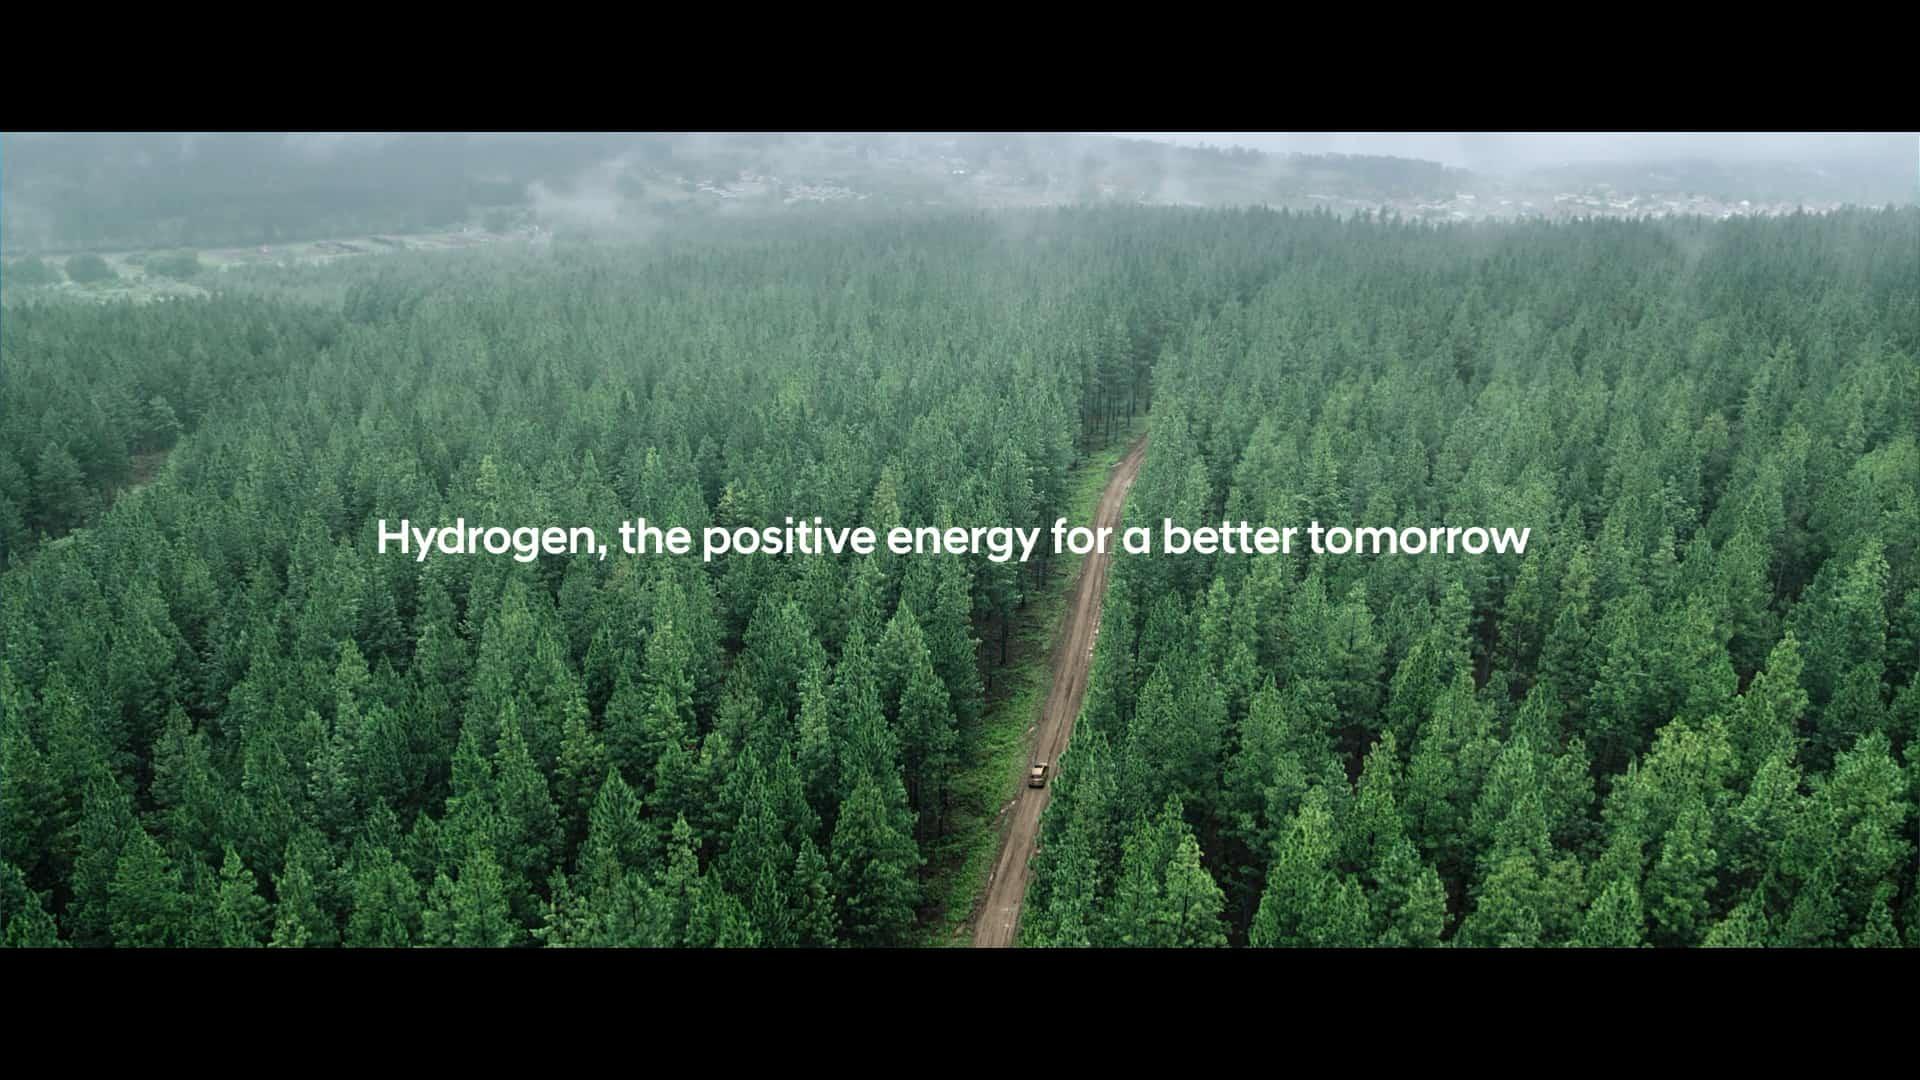 hyundai hydrogen commitment on forest scene